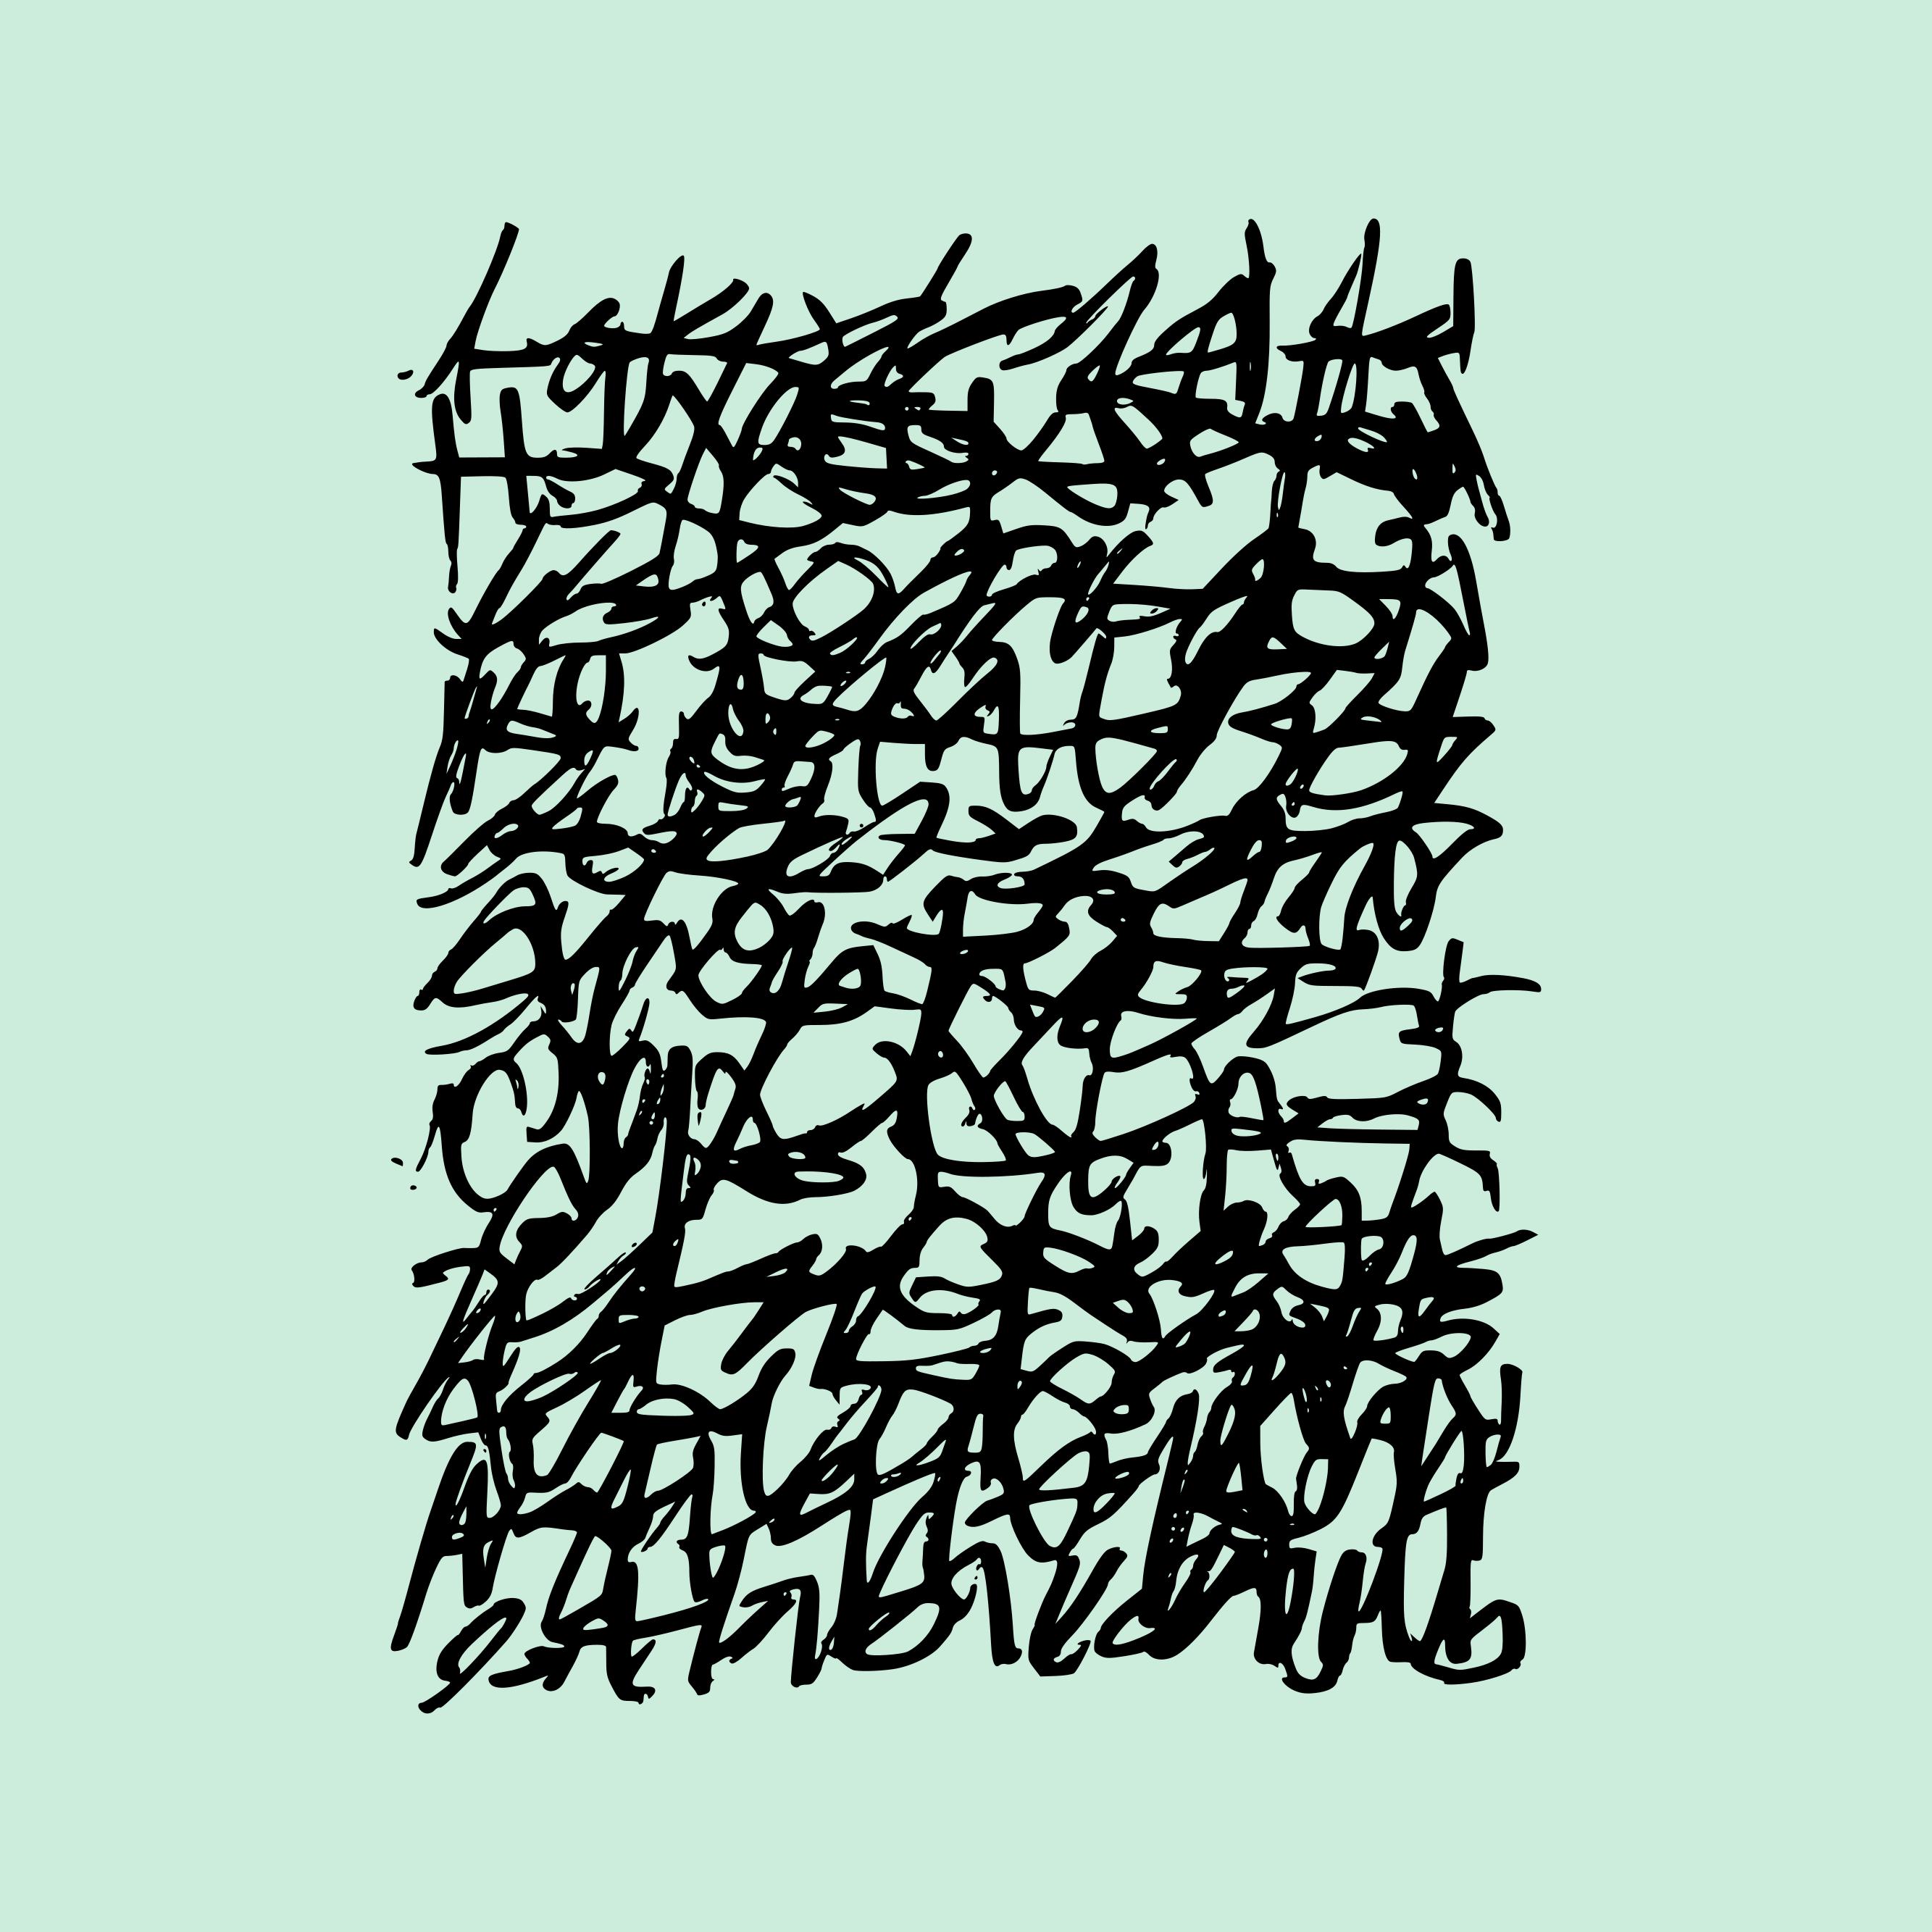 Motif Typographie